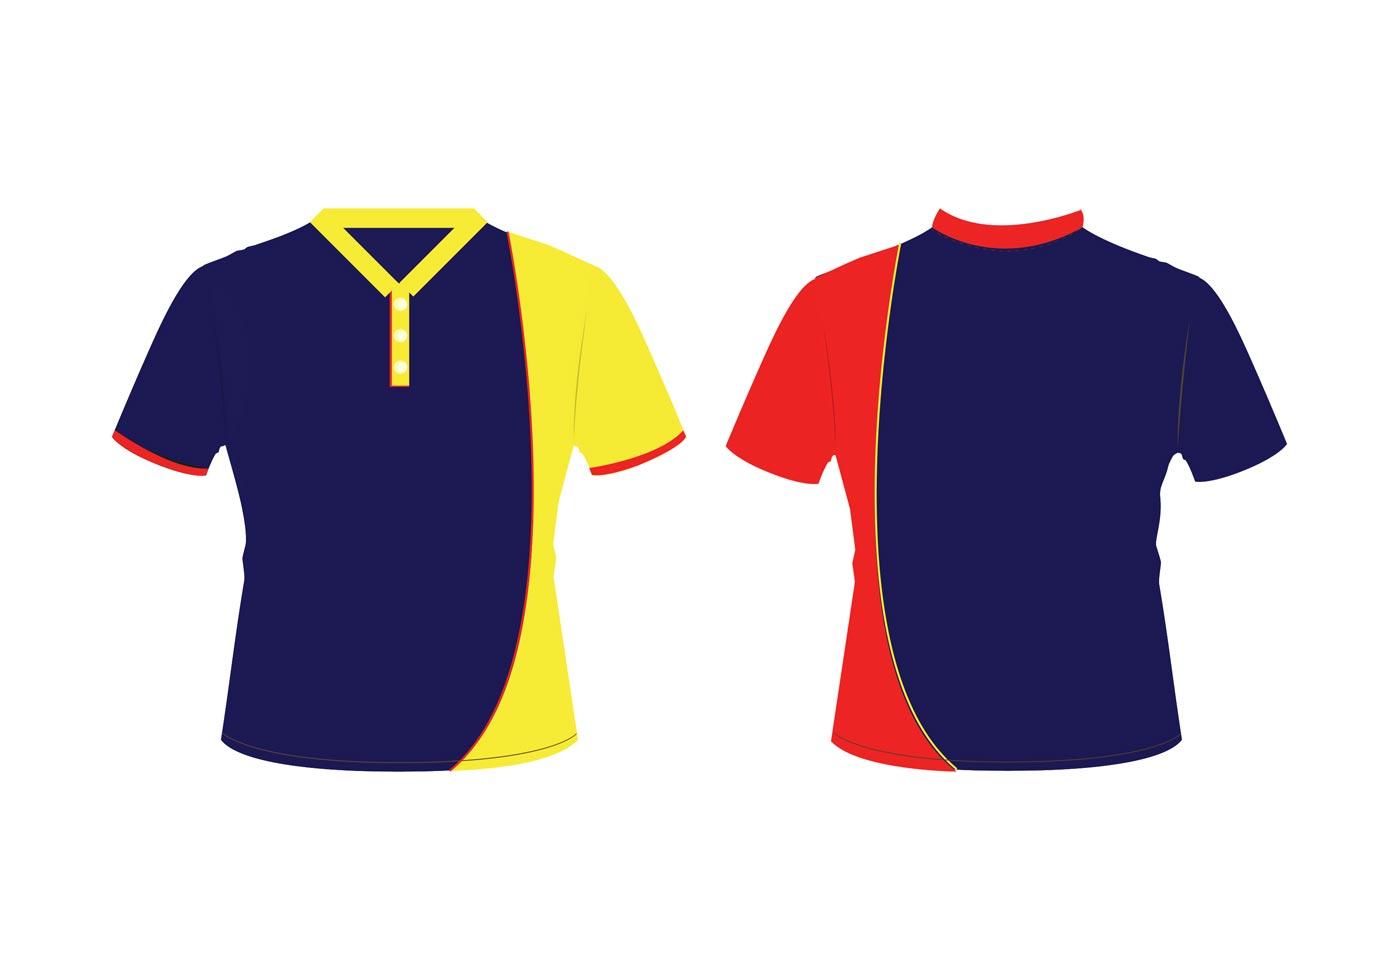 Vector t shirt graphics download free vector art stock for T shirt design vector